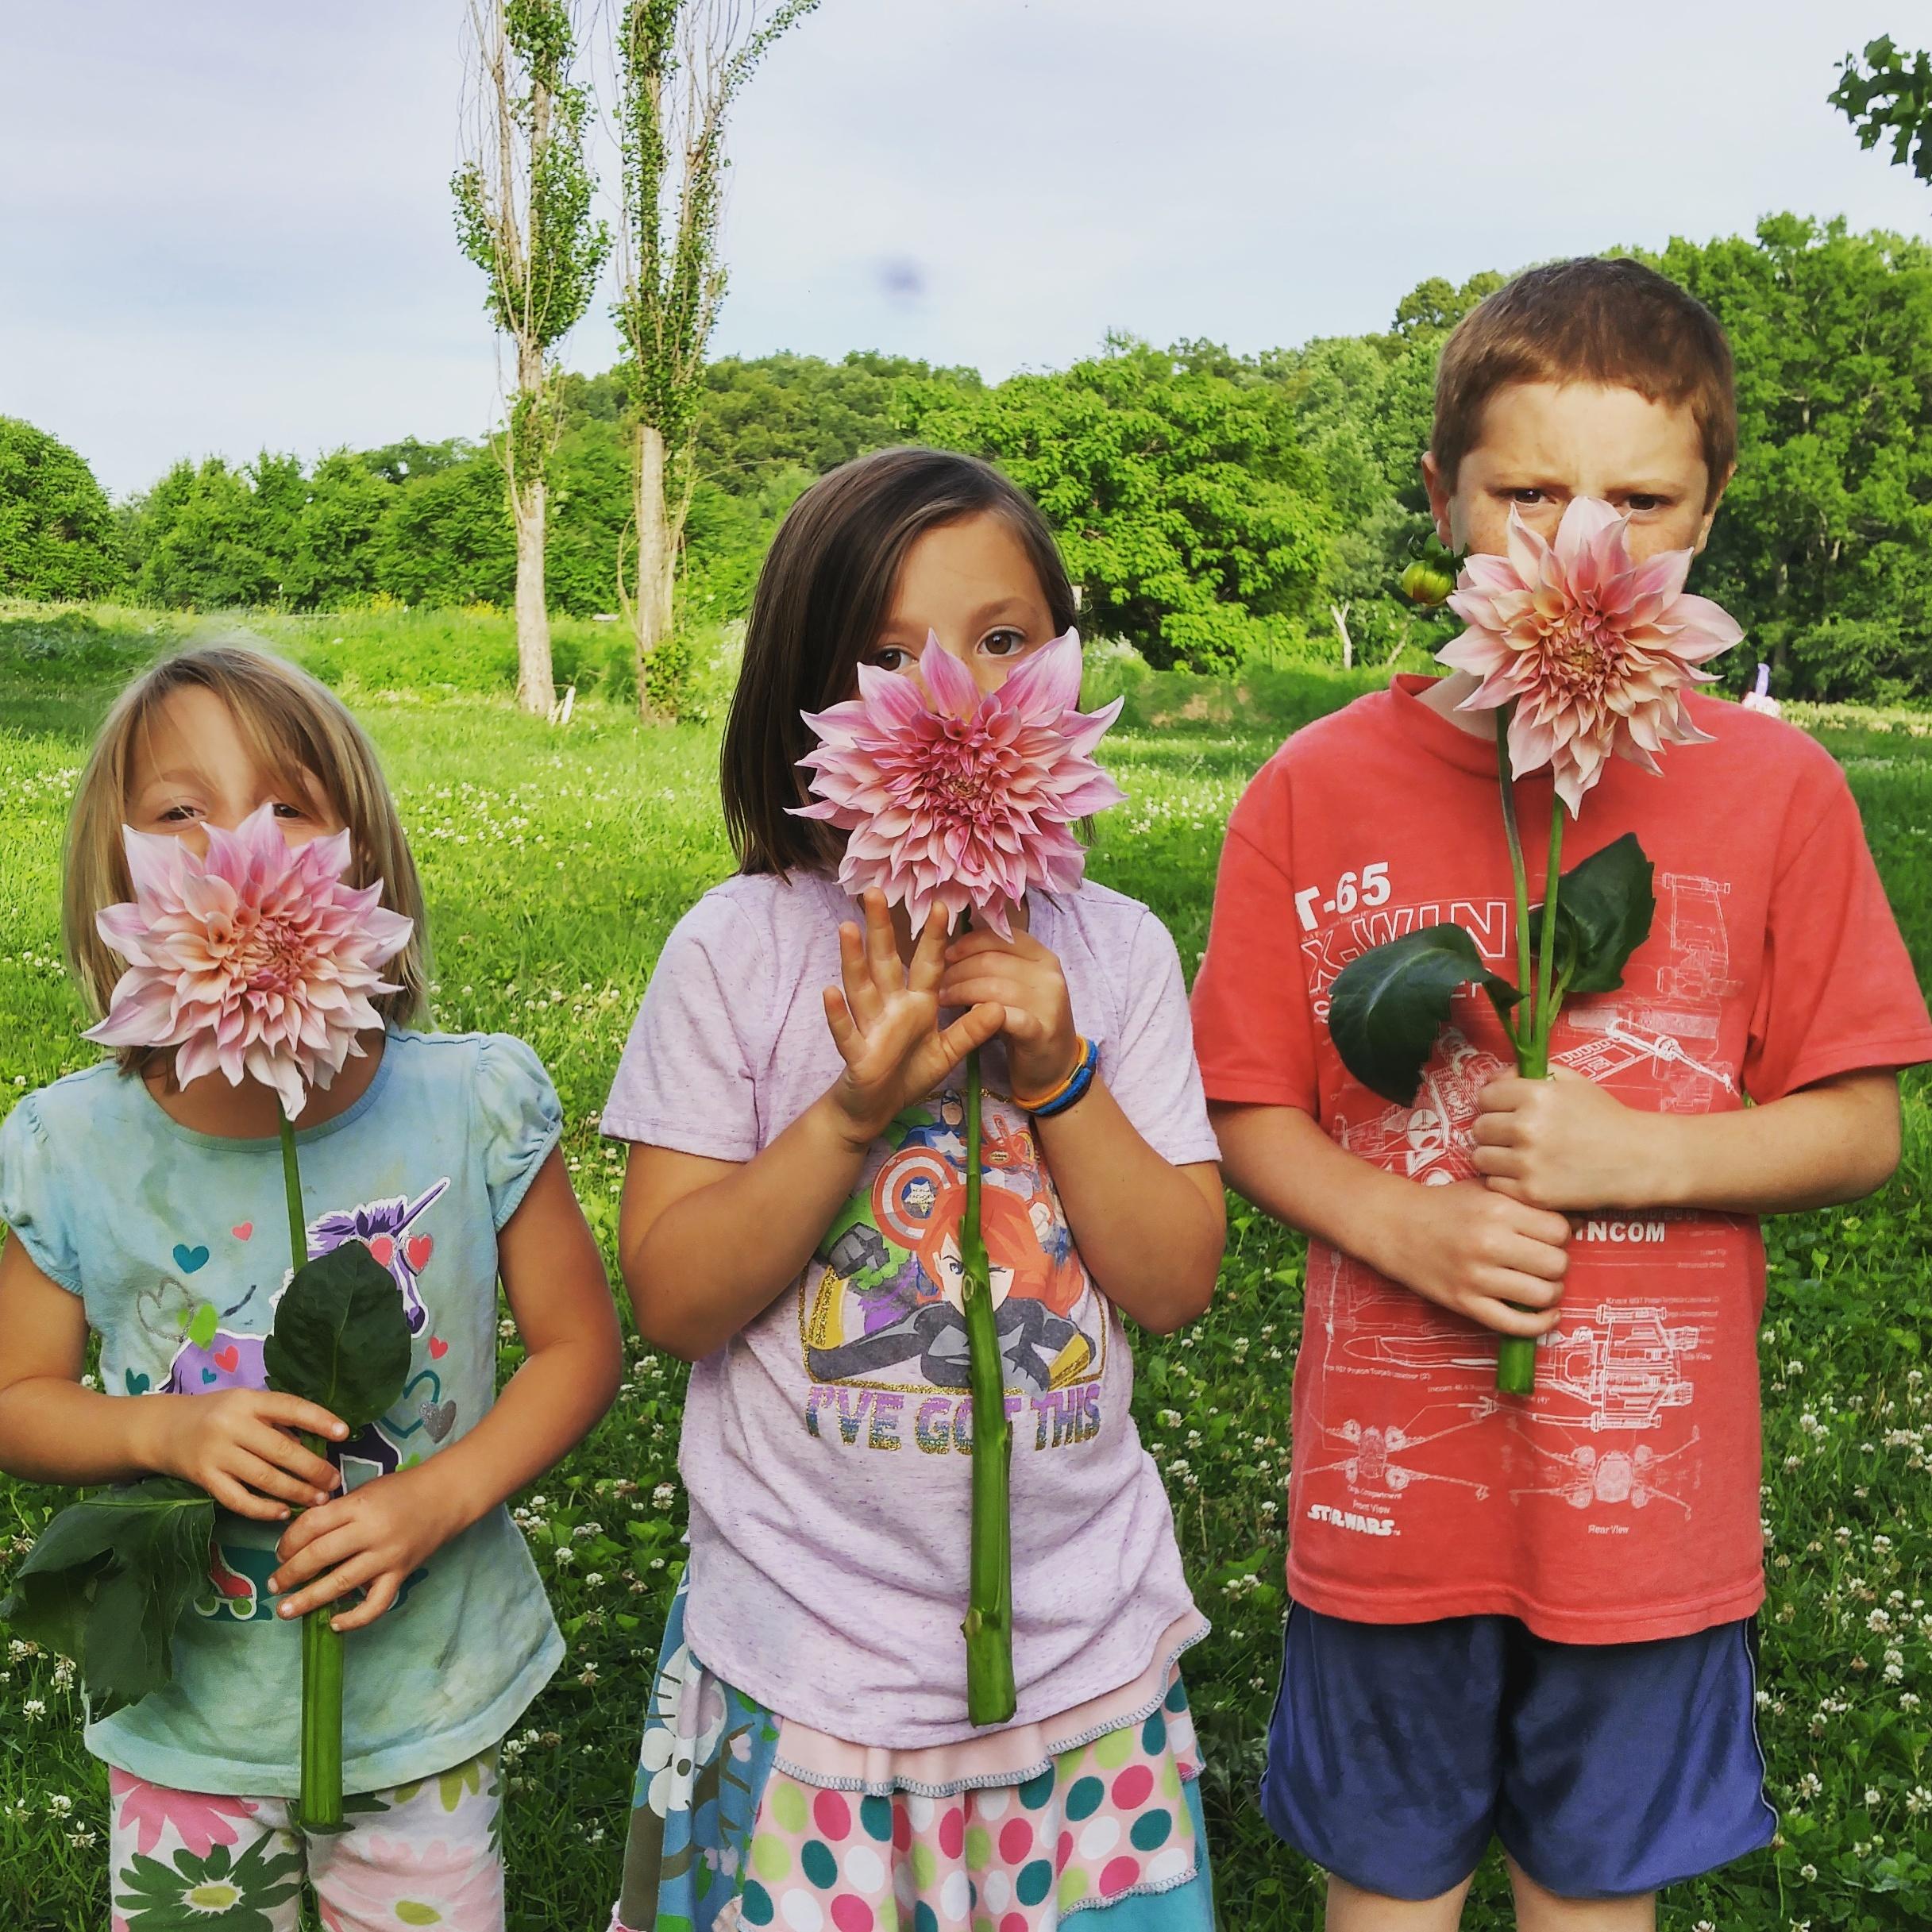 Kids on a flower farm holding organic cafe au lait dahlias